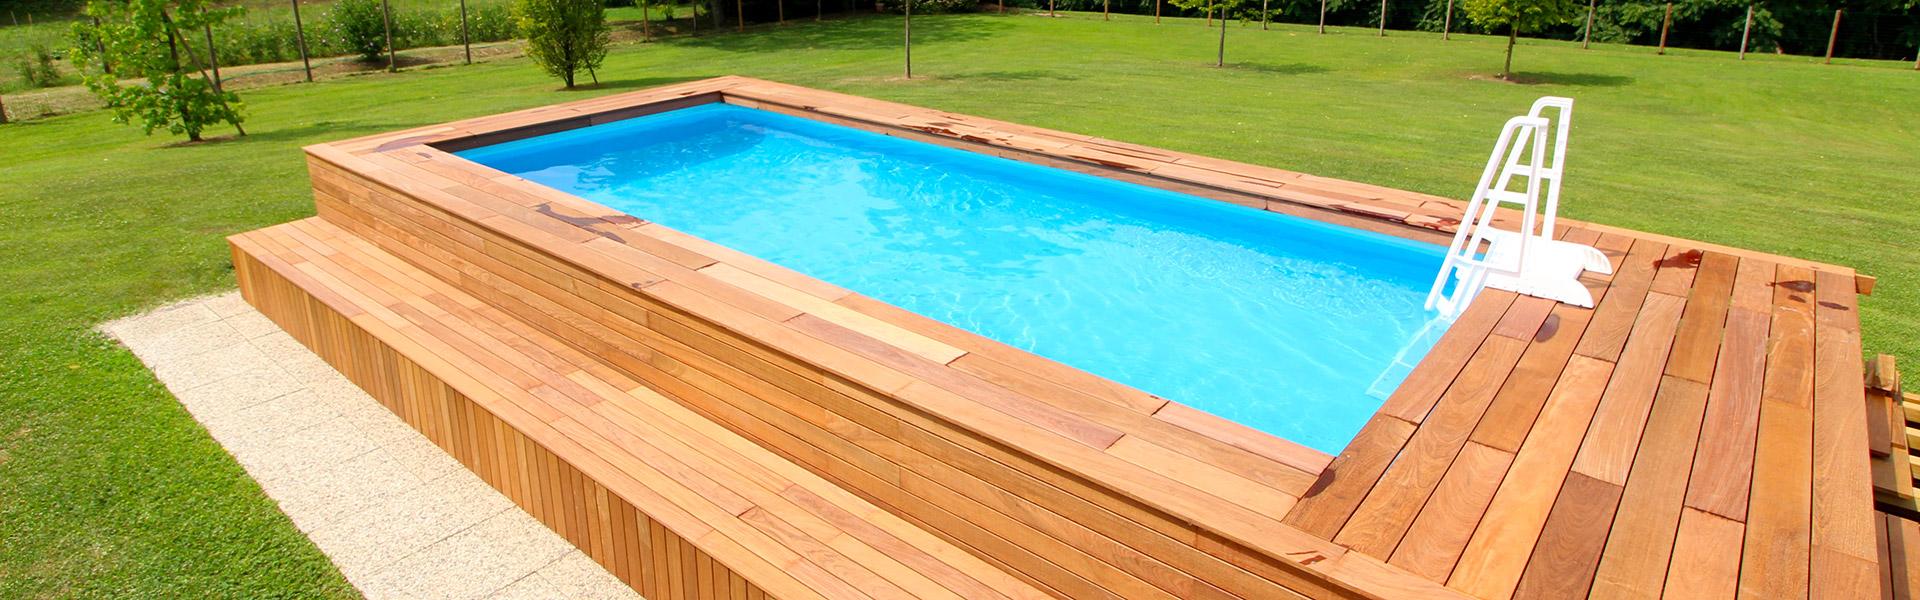 Acqua Azzurra Piscine piscine fuoriterra | piscine, da terrazzo e giardino